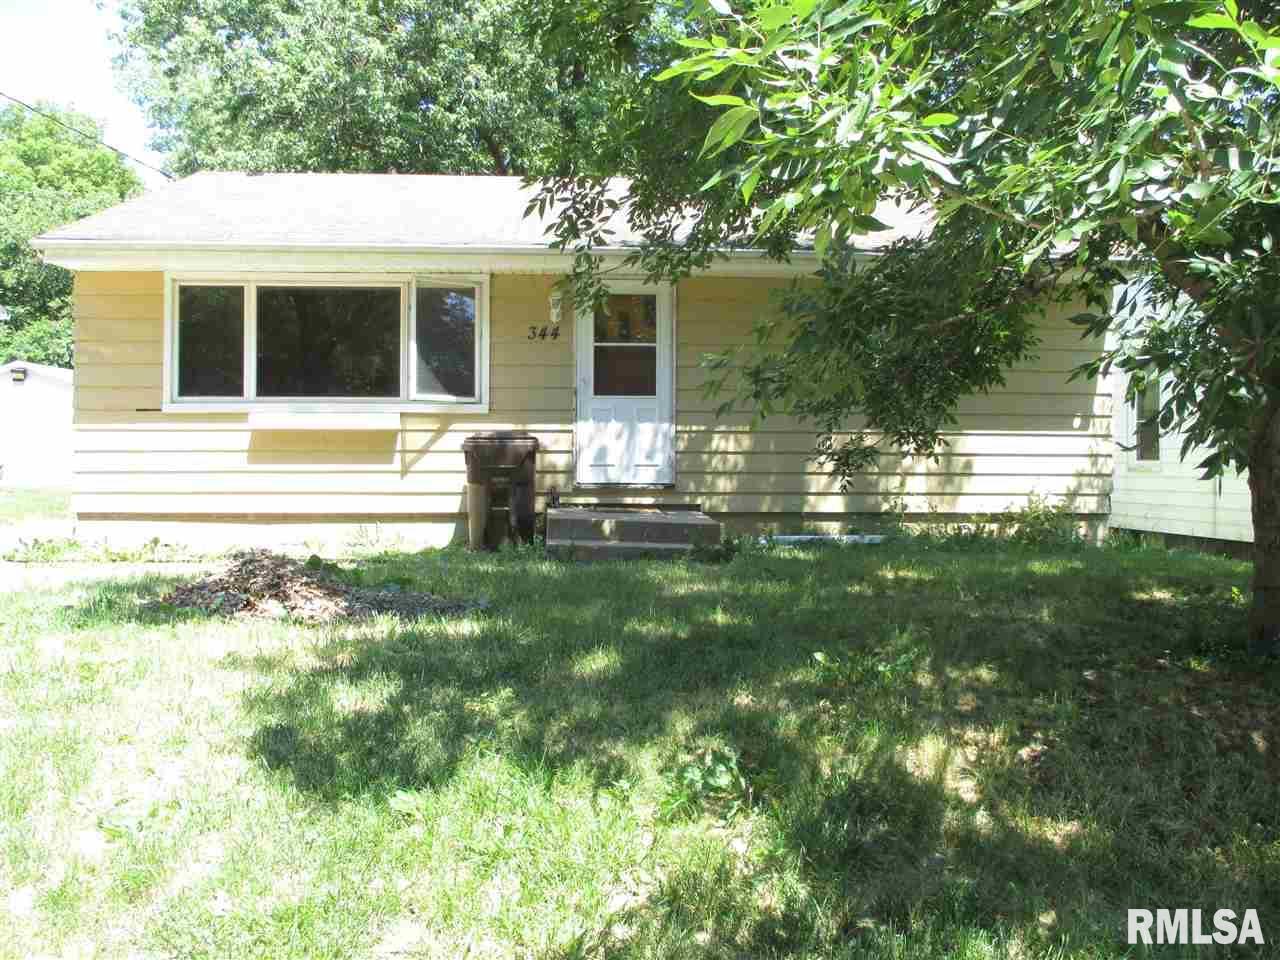 344 LAWNRIDGE Property Photo - Creve Coeur, IL real estate listing